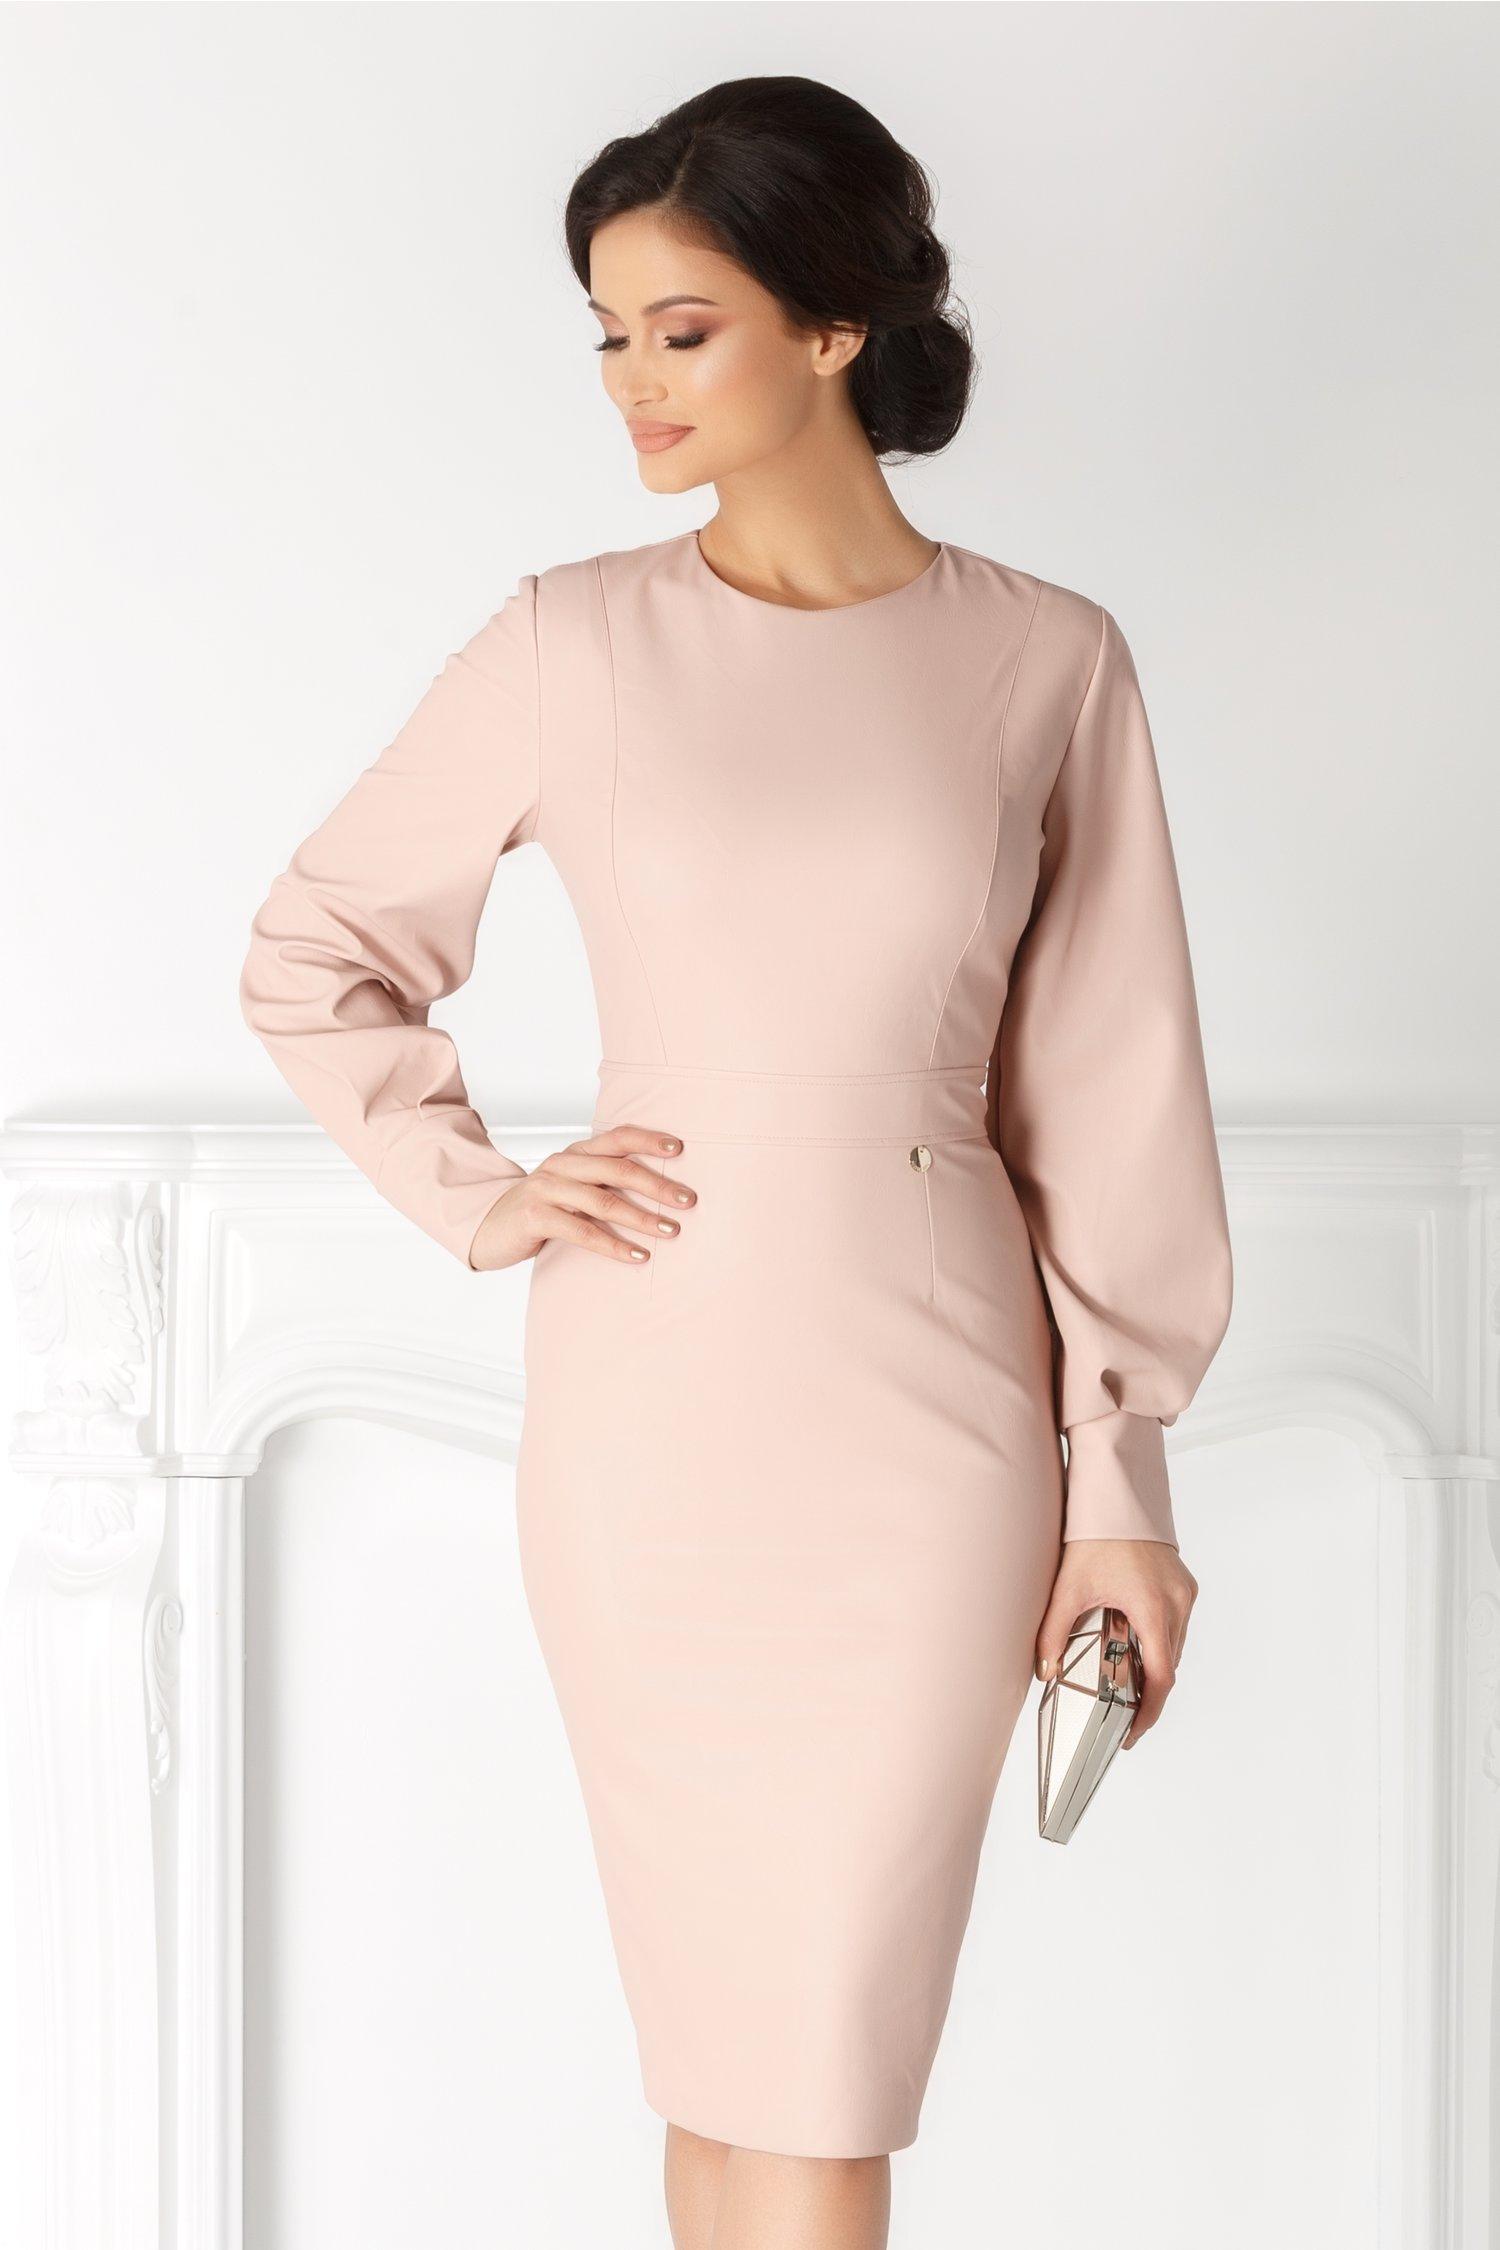 Rochie Shay roz pal din piele ecologica